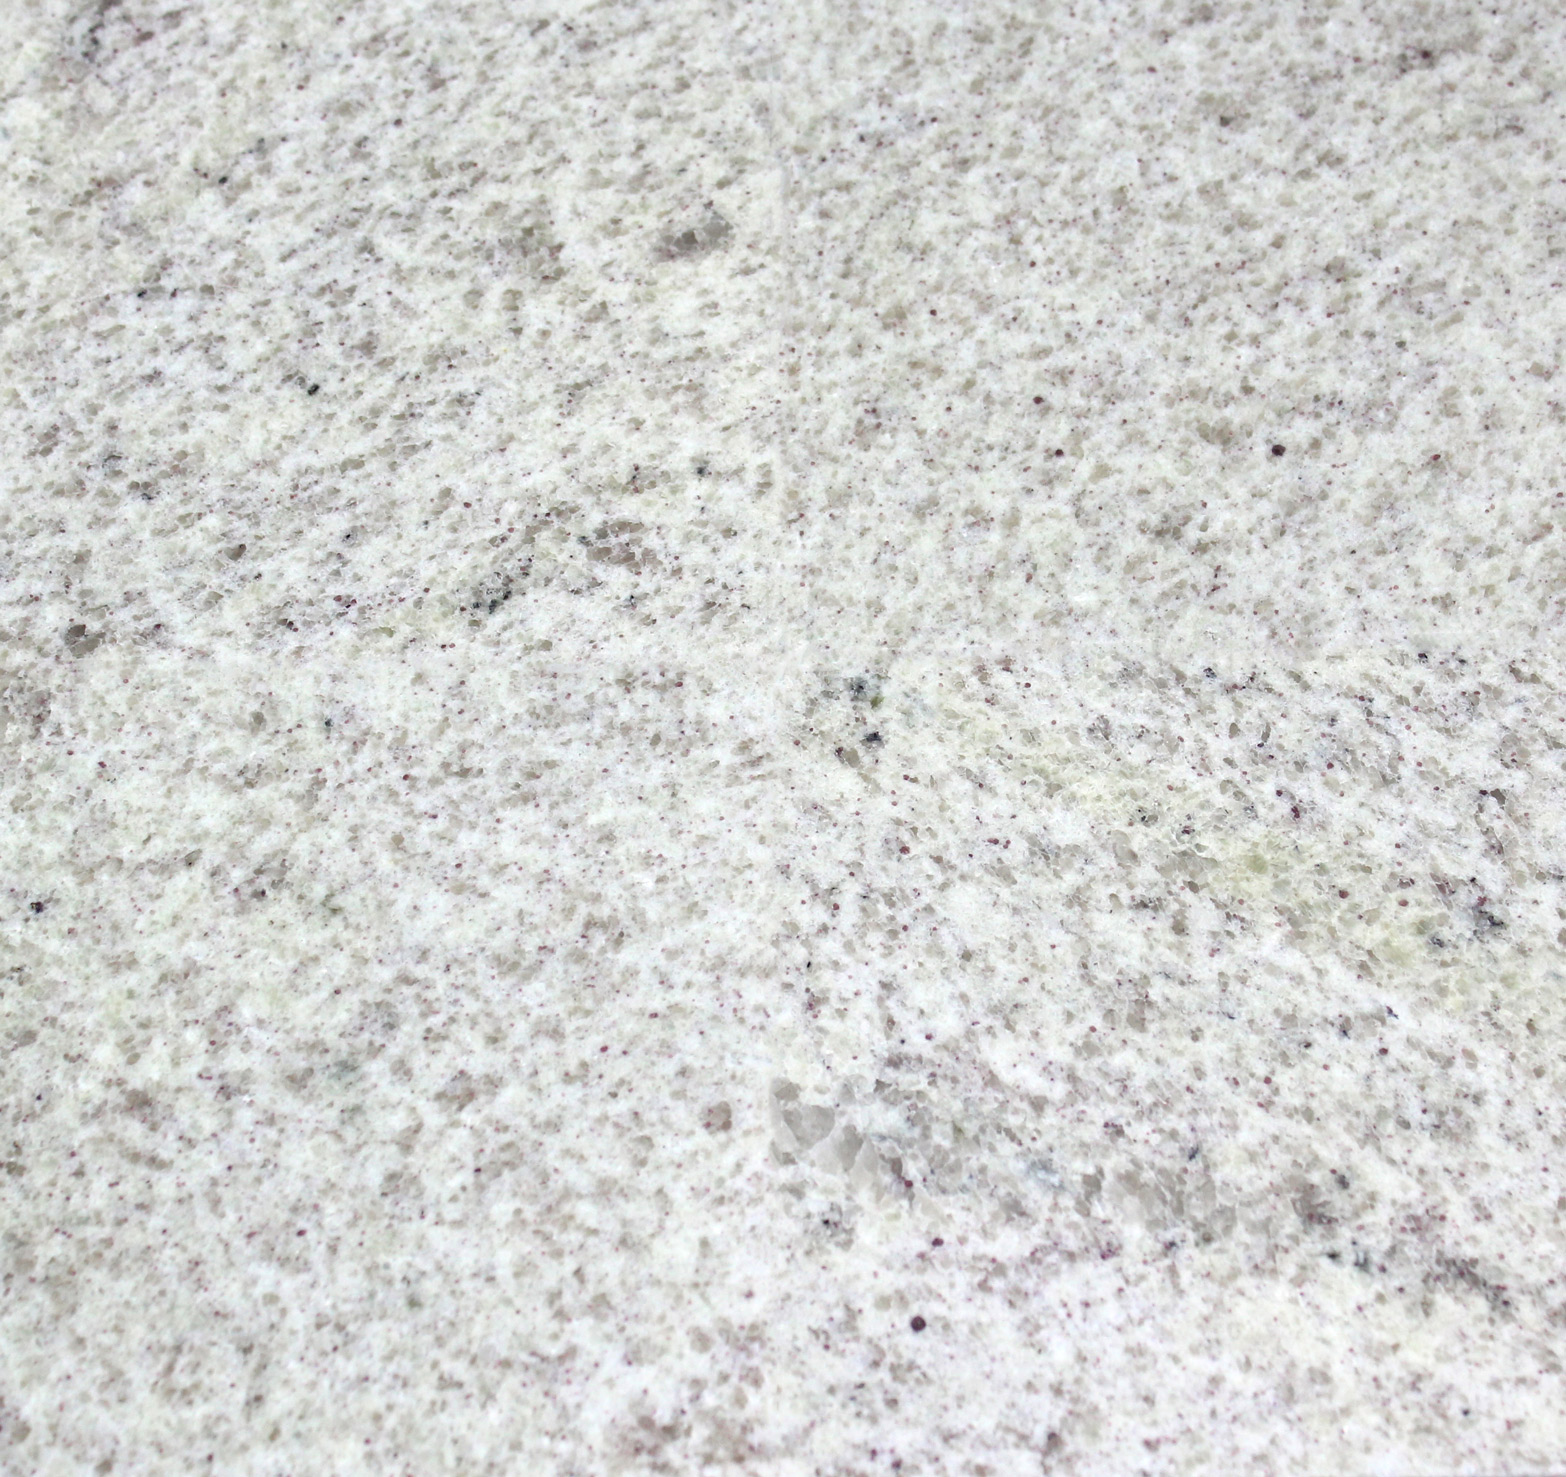 Granito branco siena vsb piso de granito for Tipos de granito para pisos